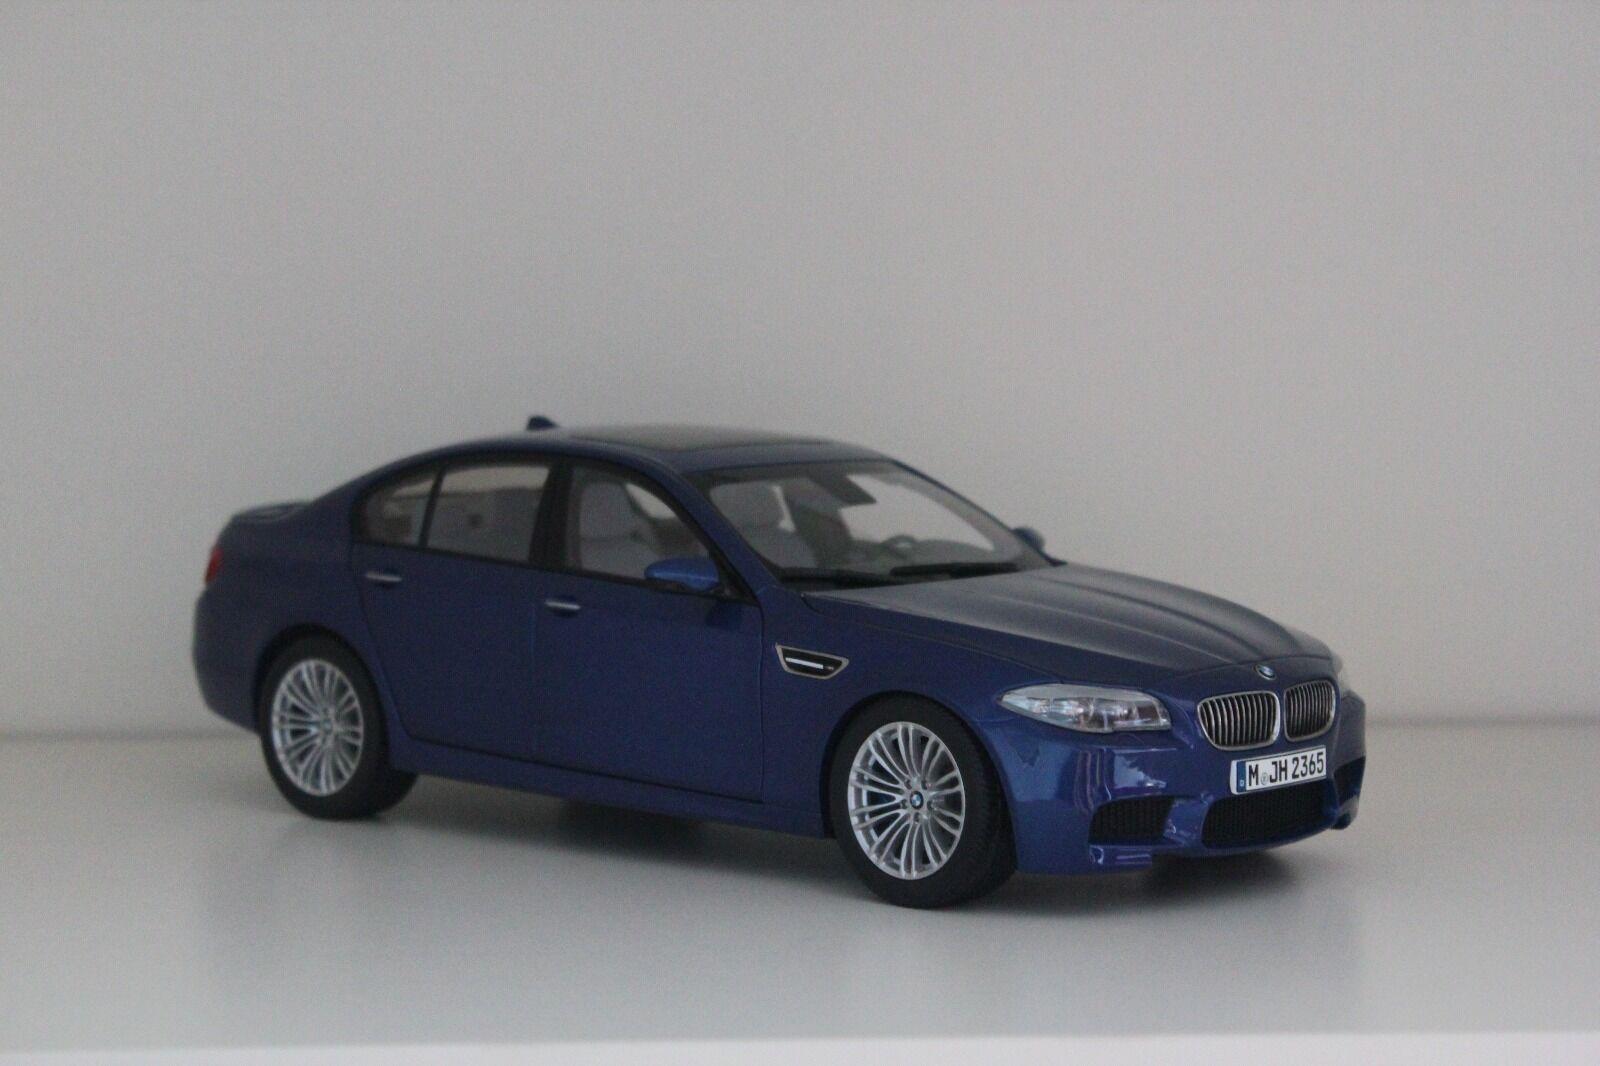 Paragon BMW M5 F10 Monte Carlo blu 80432186352 1:18 Dealer Edition